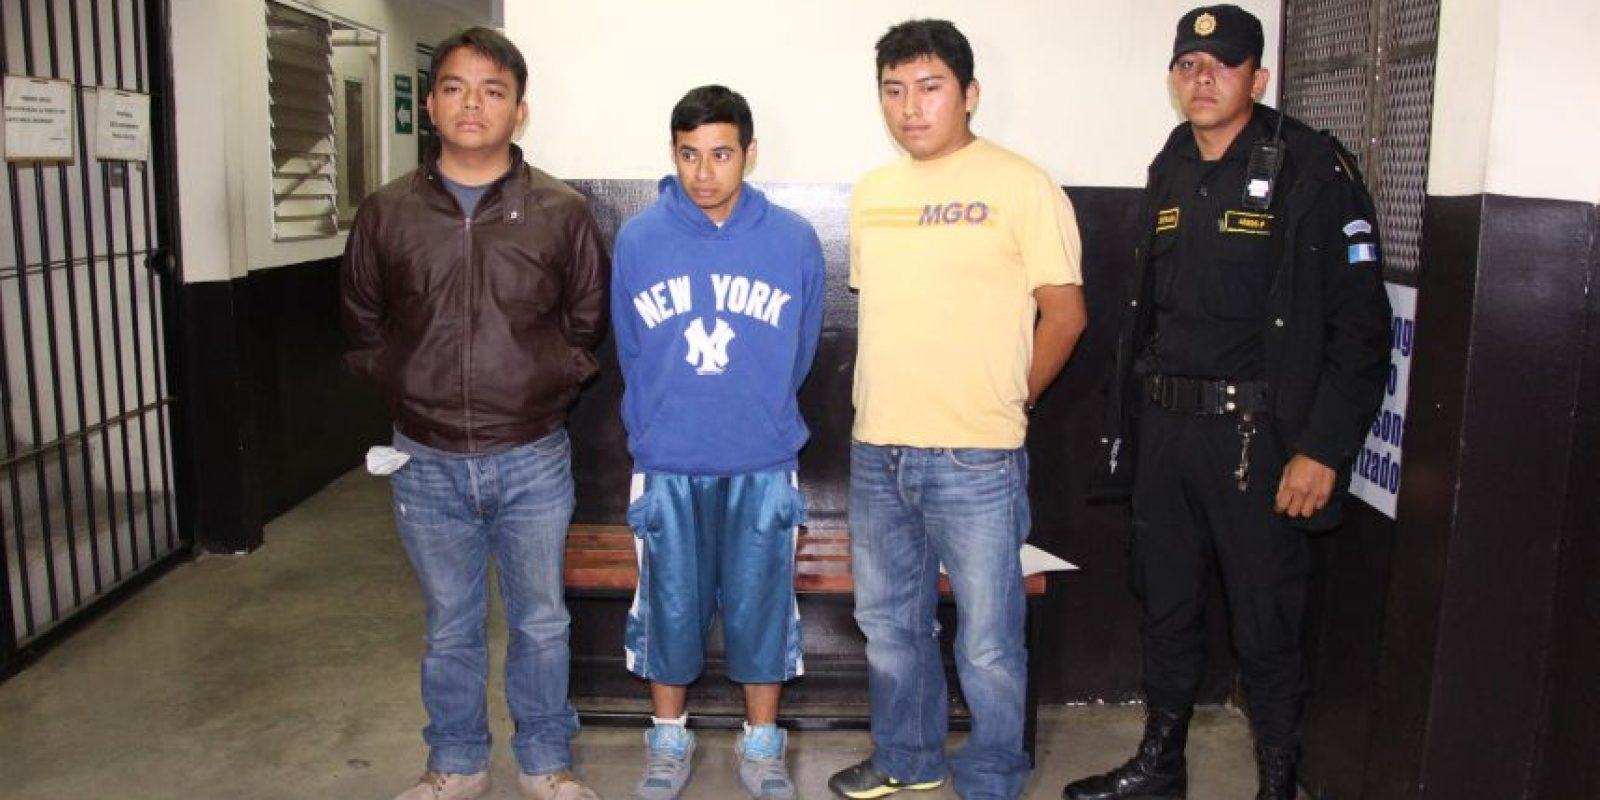 Las capturas se han realizado en la zona 1 de Mixco. Foto:PNC